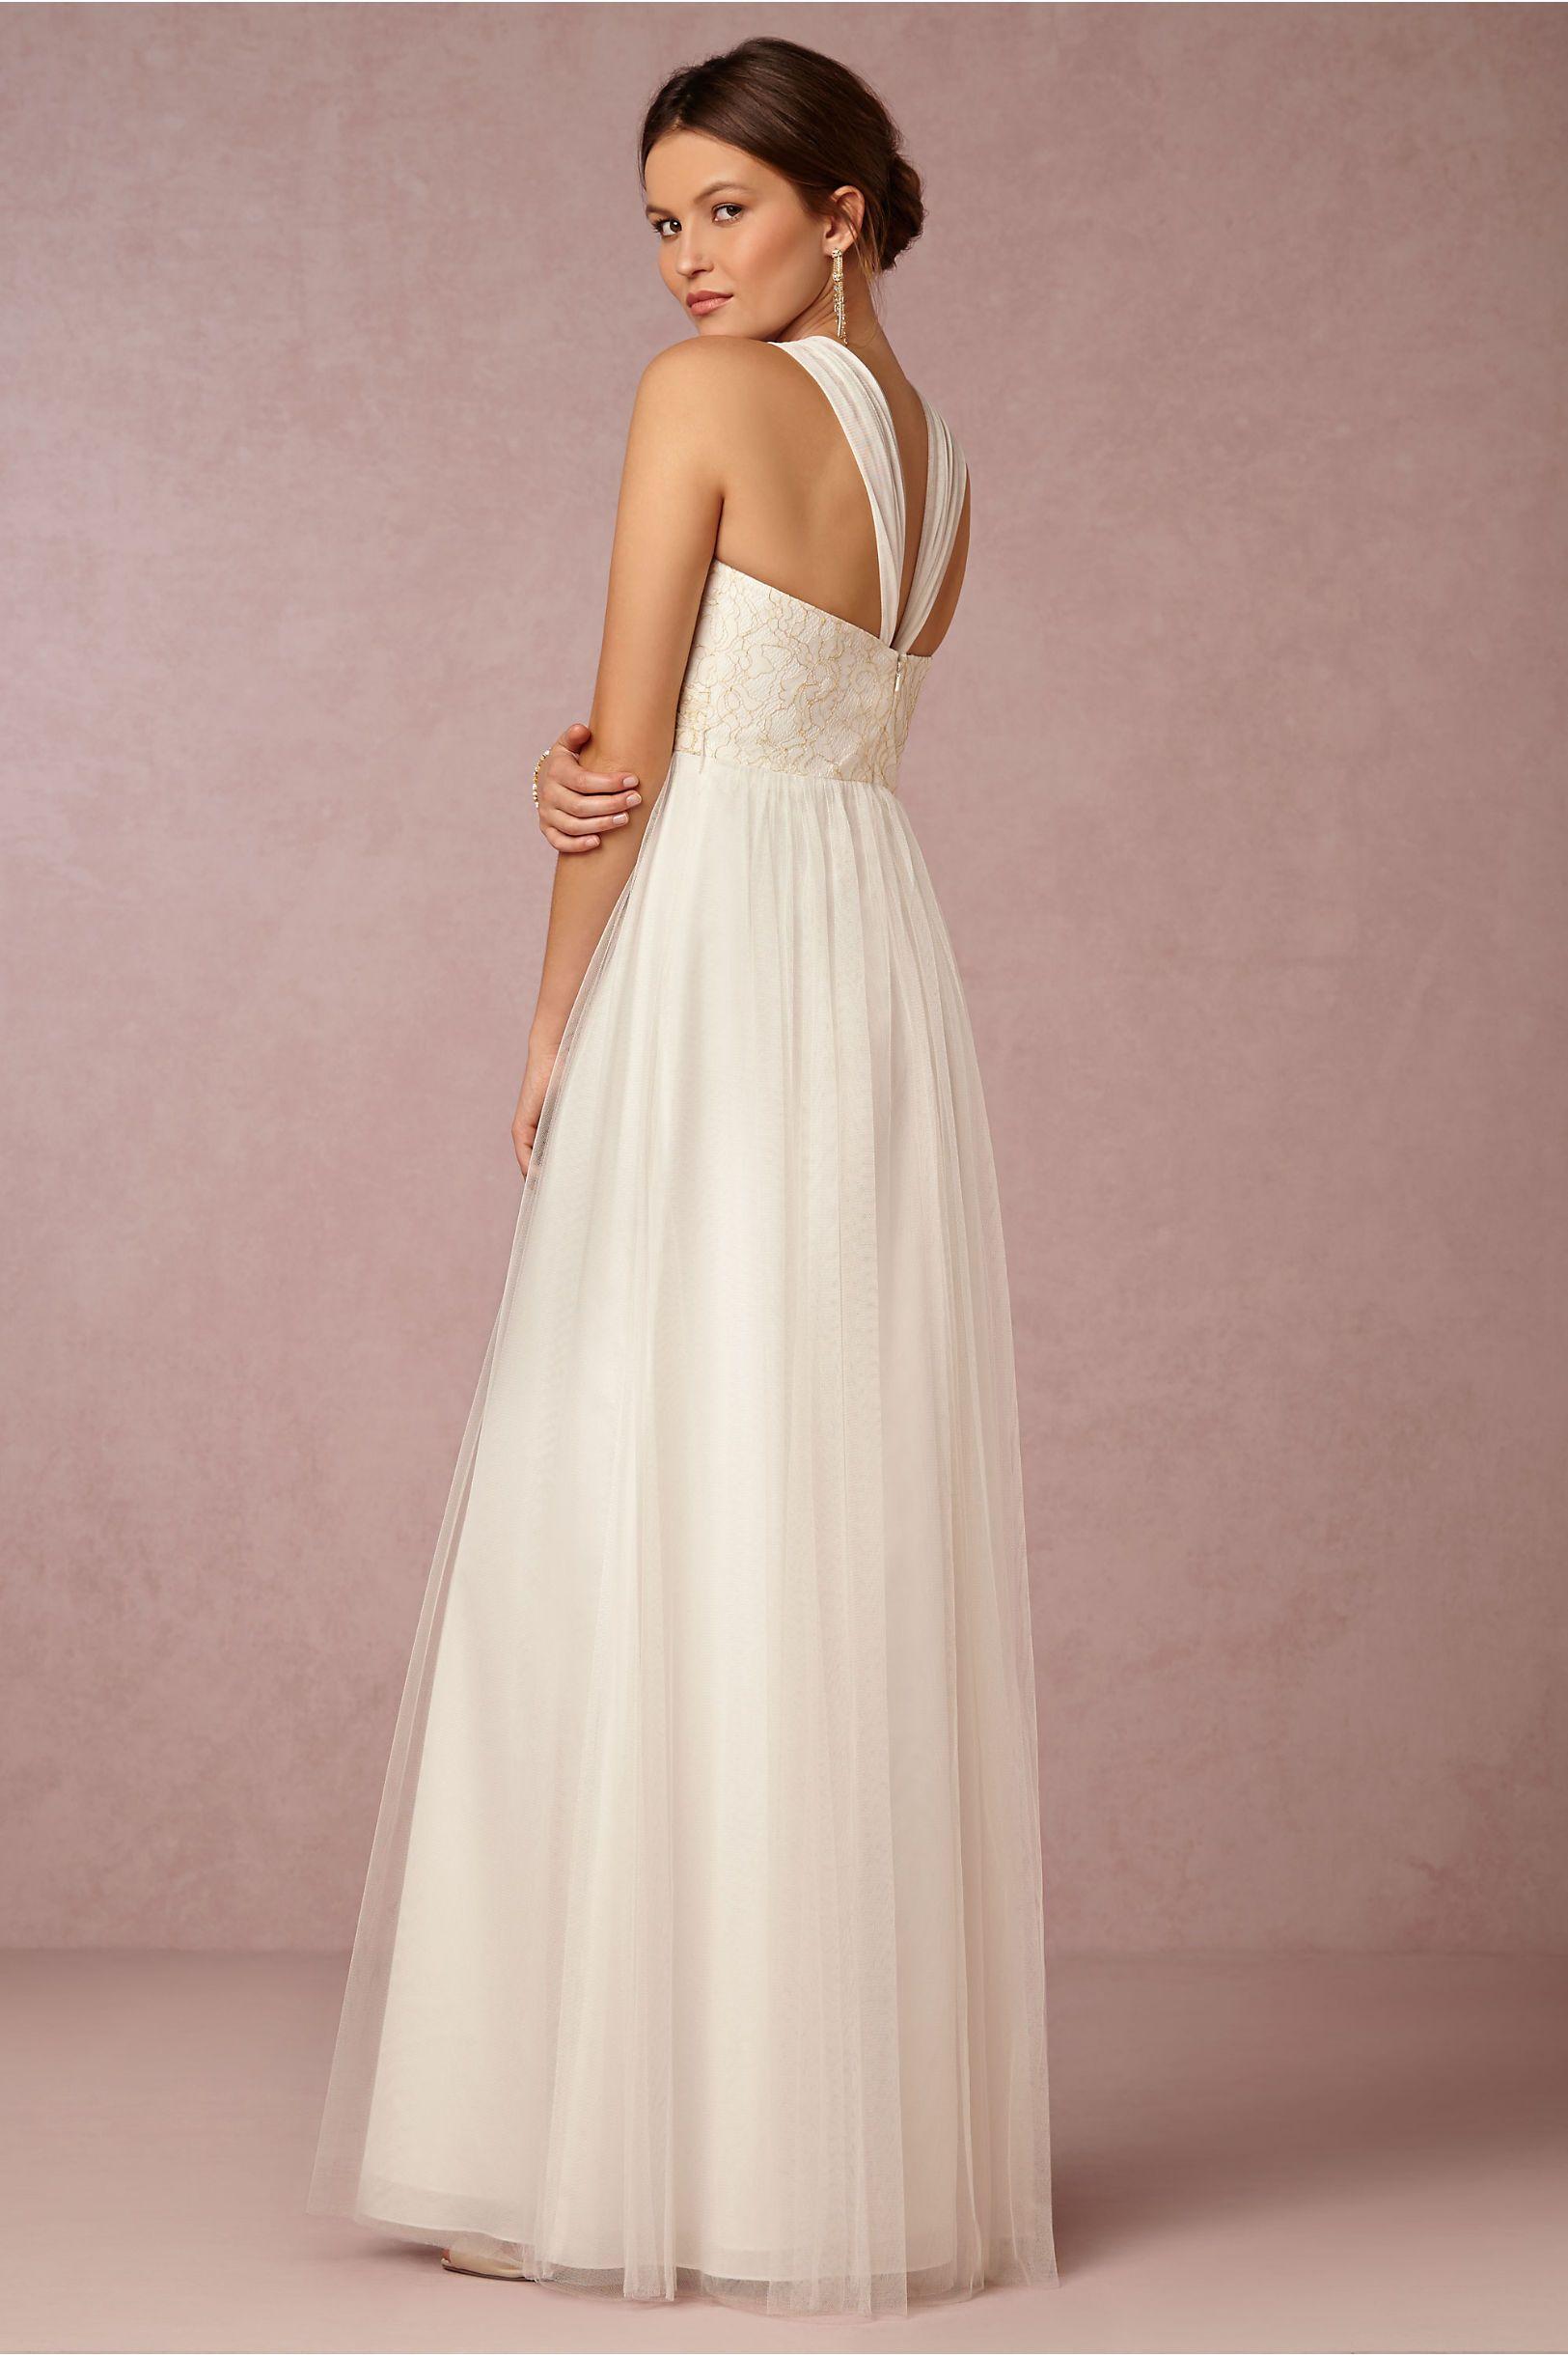 Wedding reception dresses for bride  Juliette Dress in Bride Wedding Dresses at BHLDN  Dresspiration